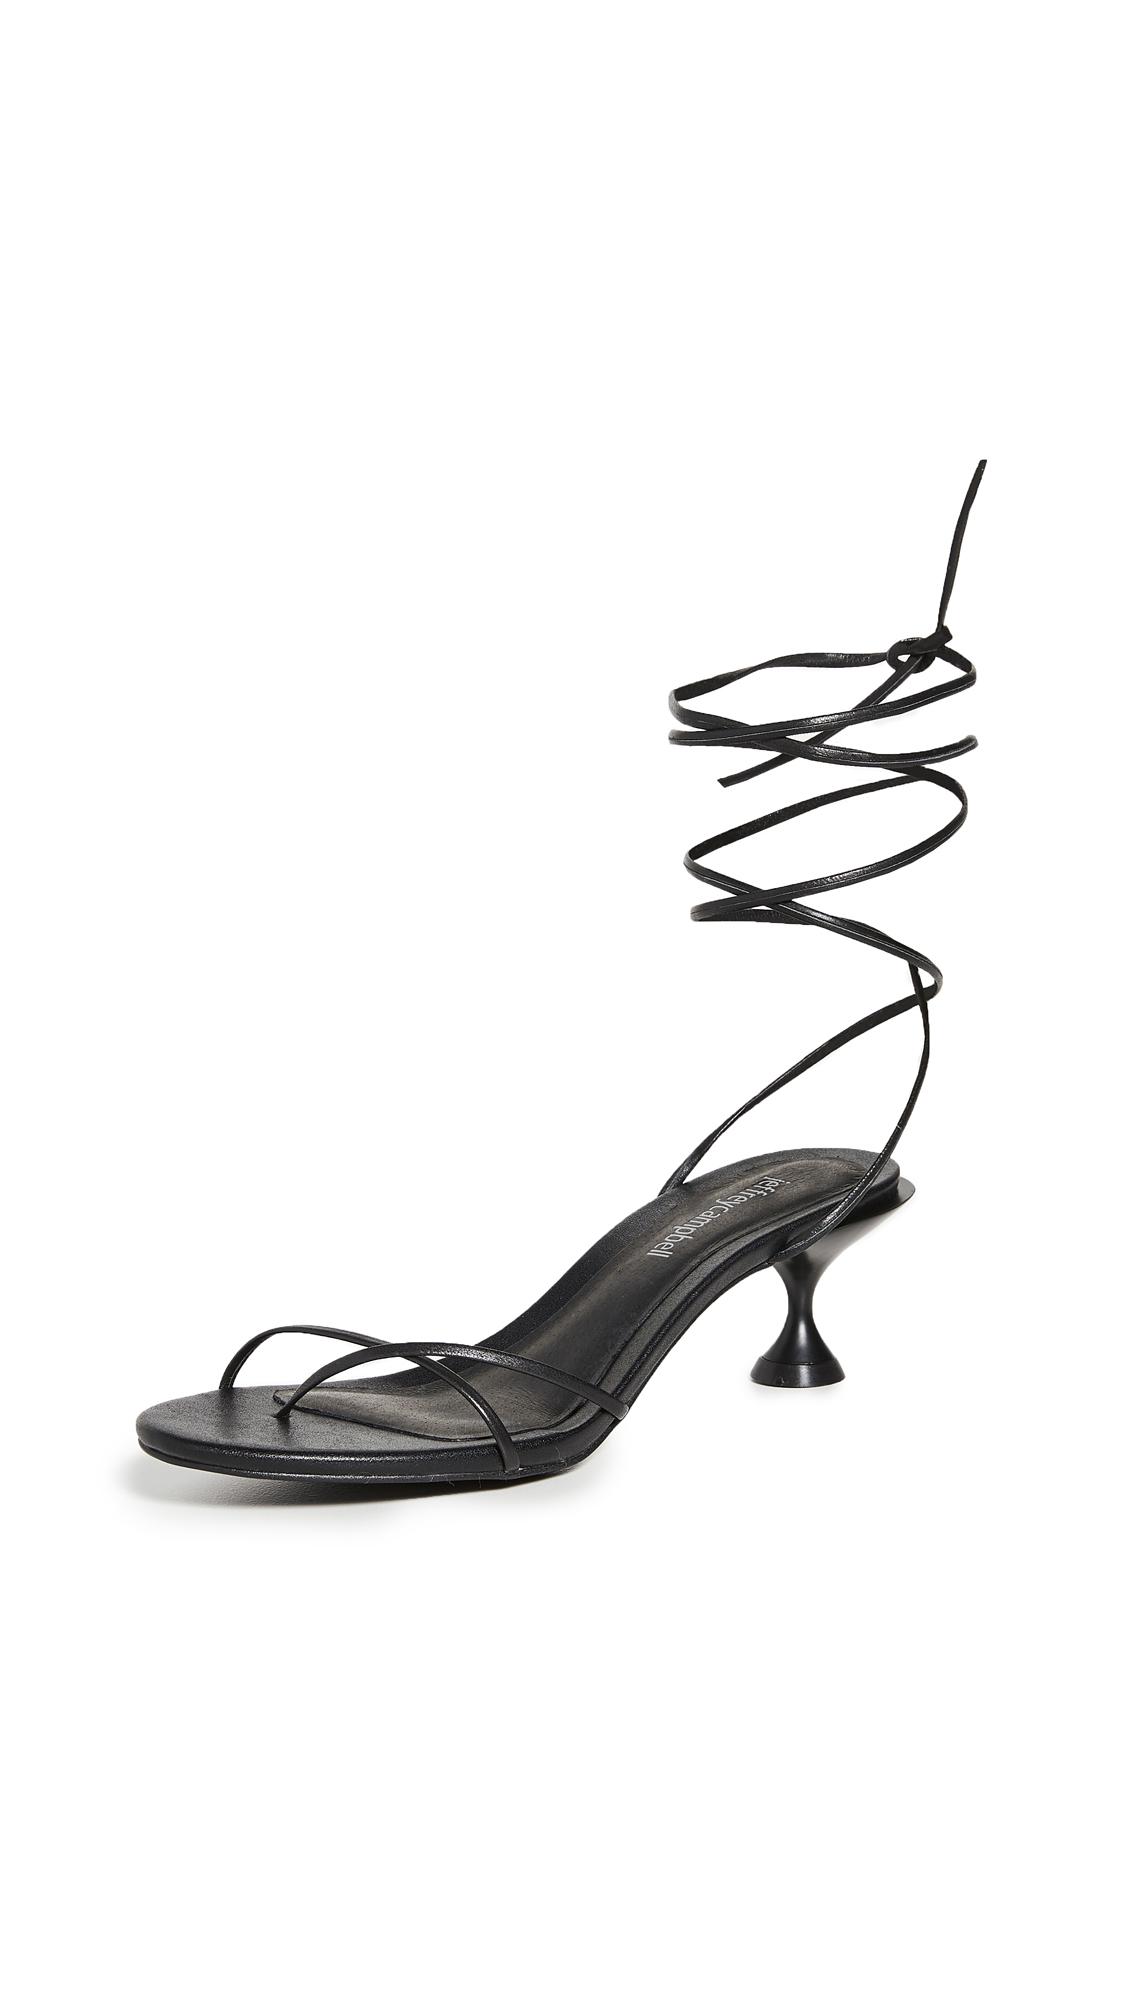 Jeffrey Campbell Khara Sandals - 40% Off Sale